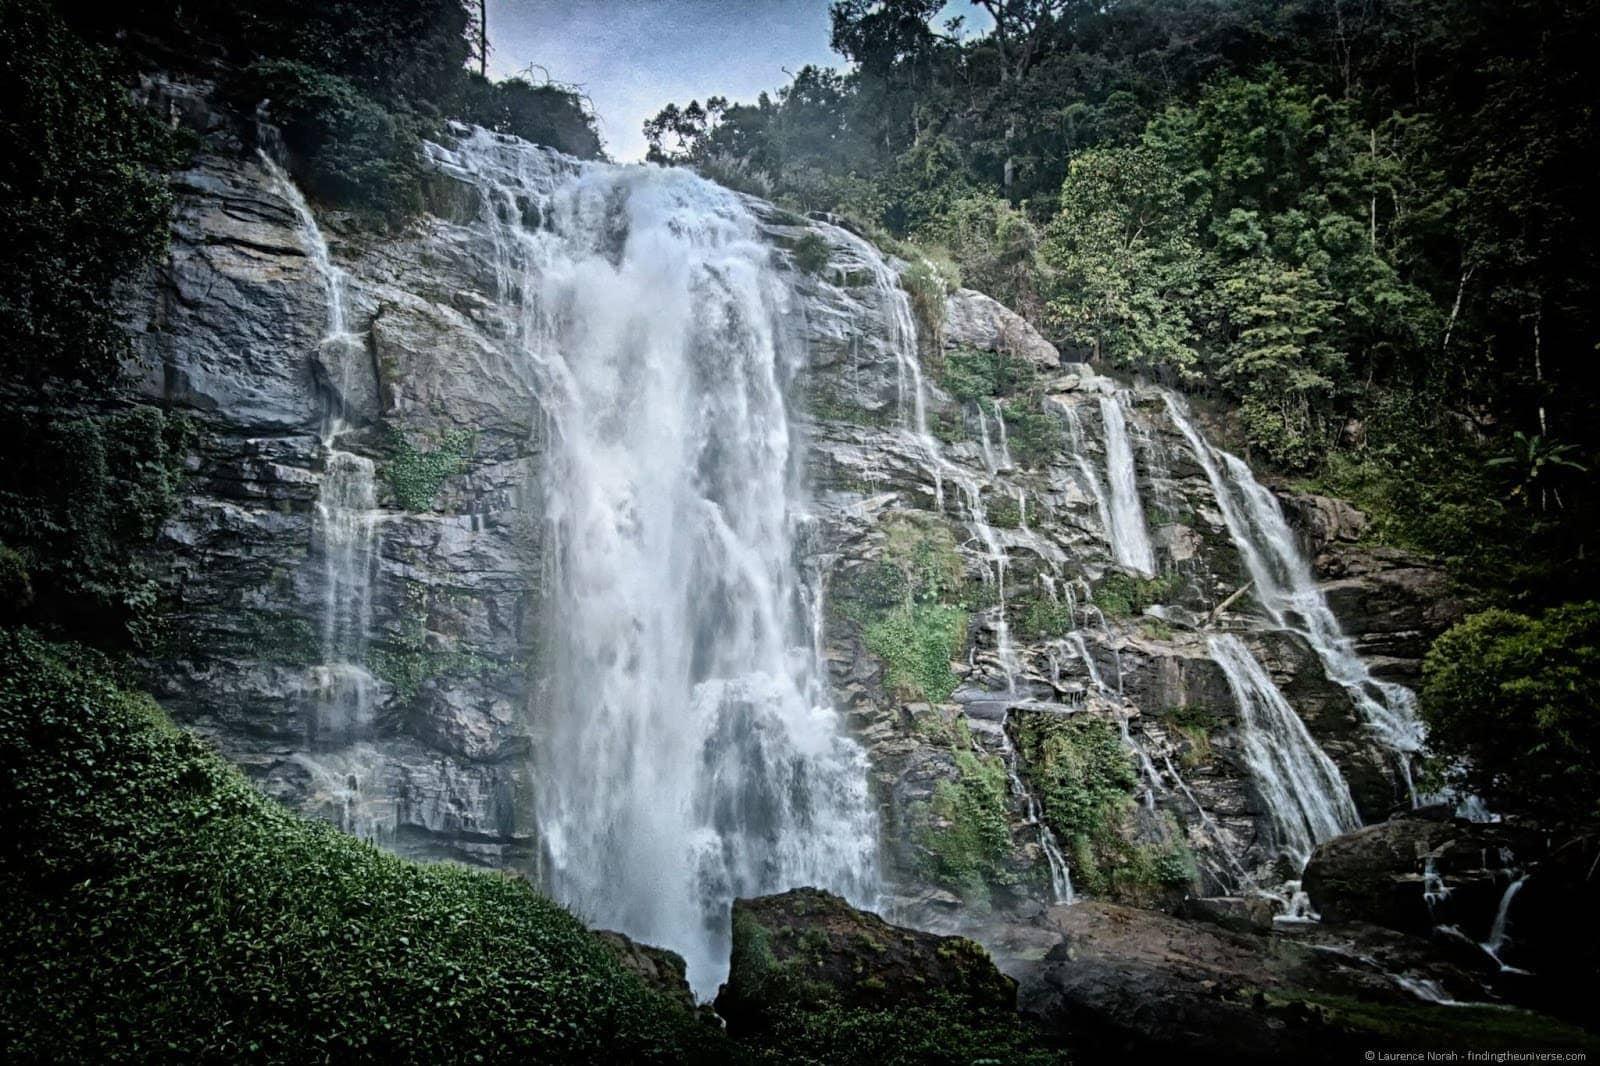 Waterfall Doi Inthanon National Park